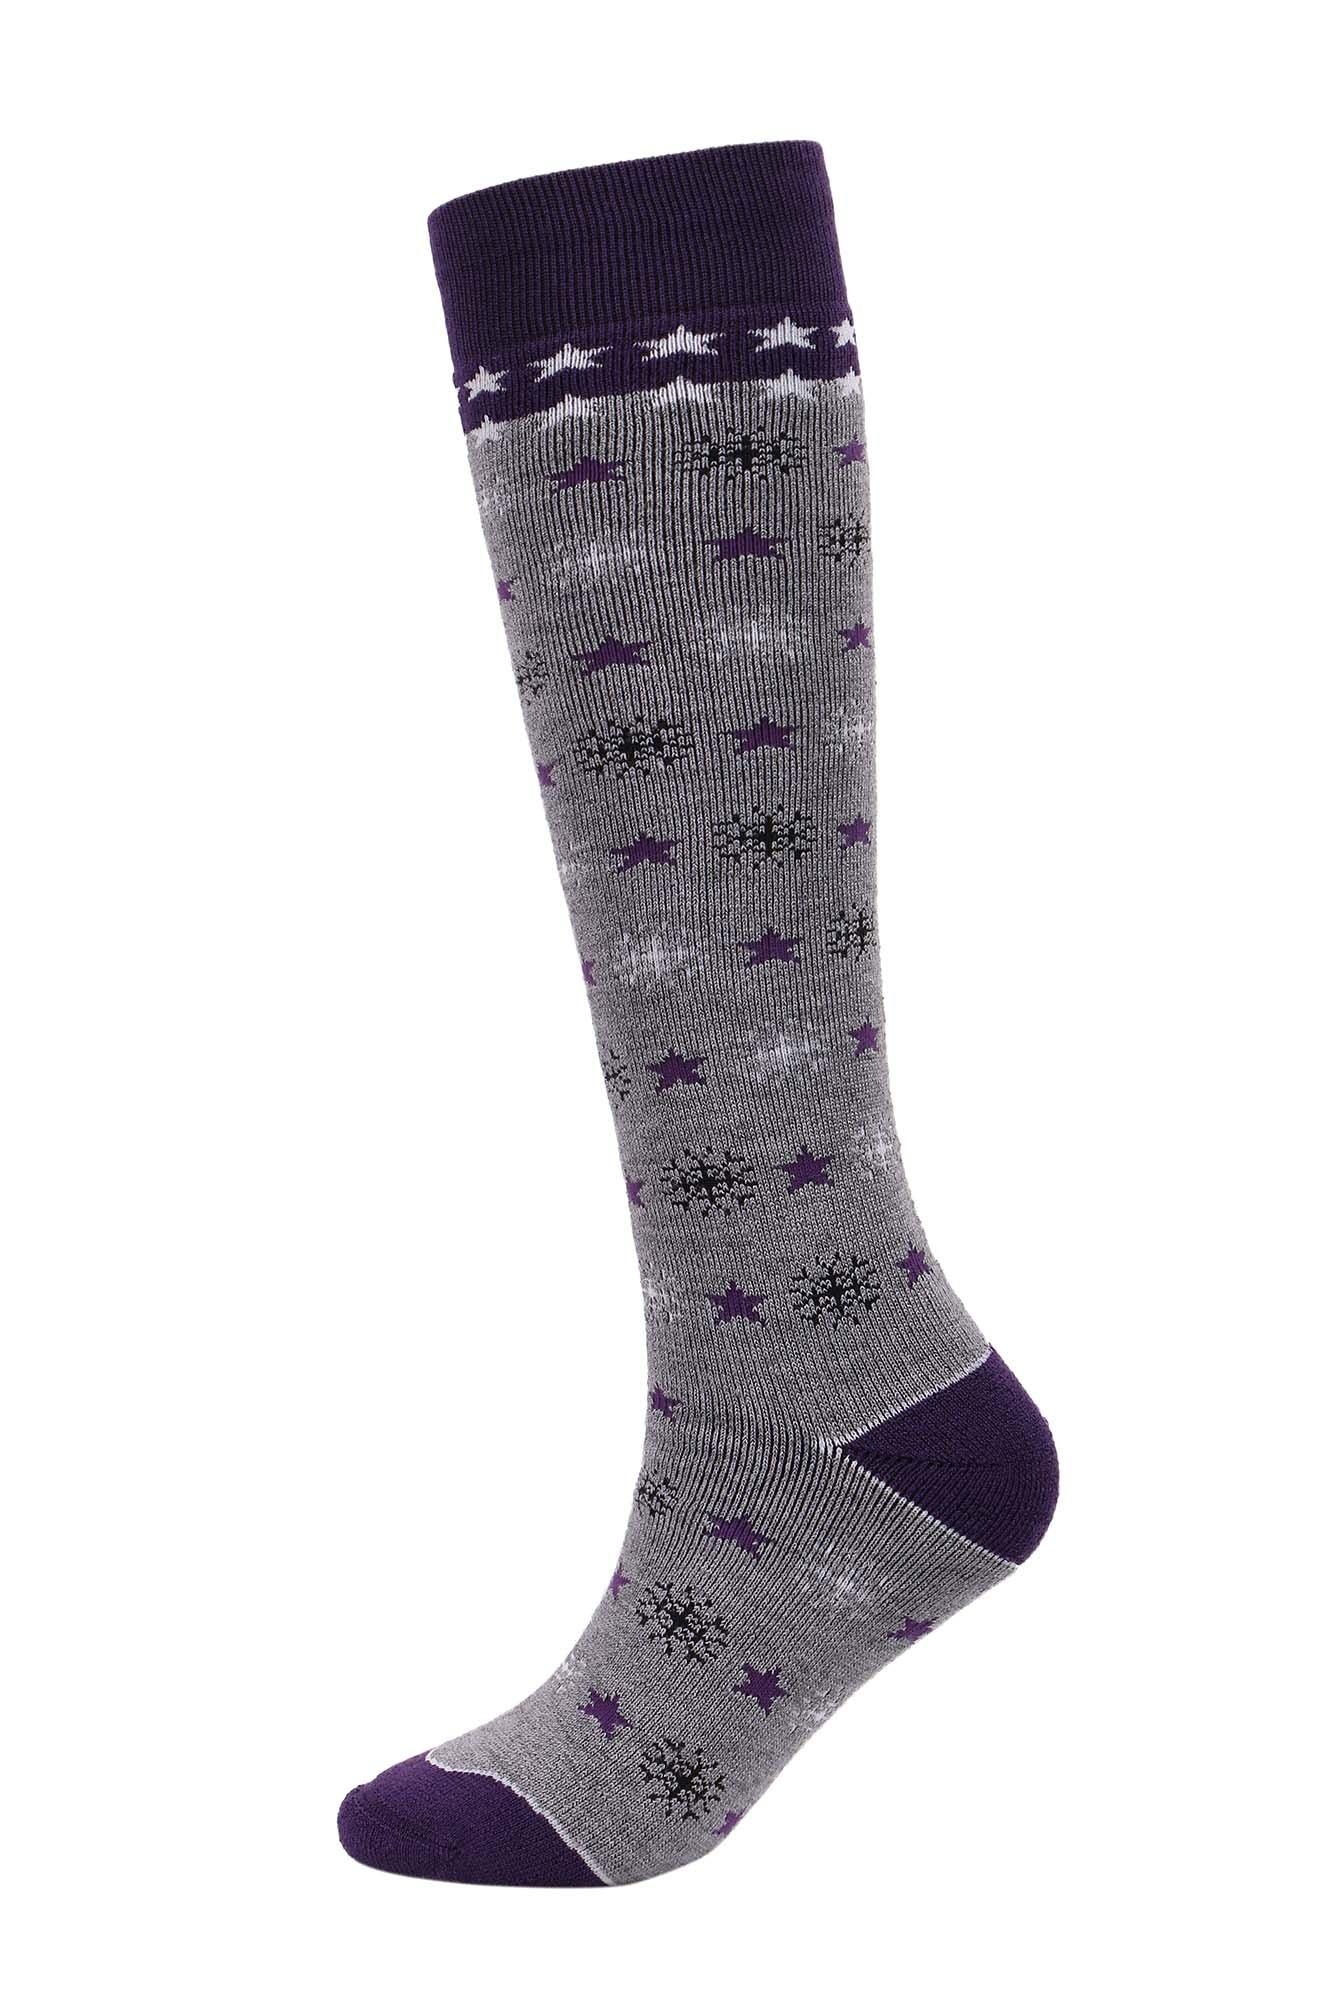 Andorra Women's Air Cushioned Merino Wool Ski Socks Full Terry Ski Socks, 8-11.5